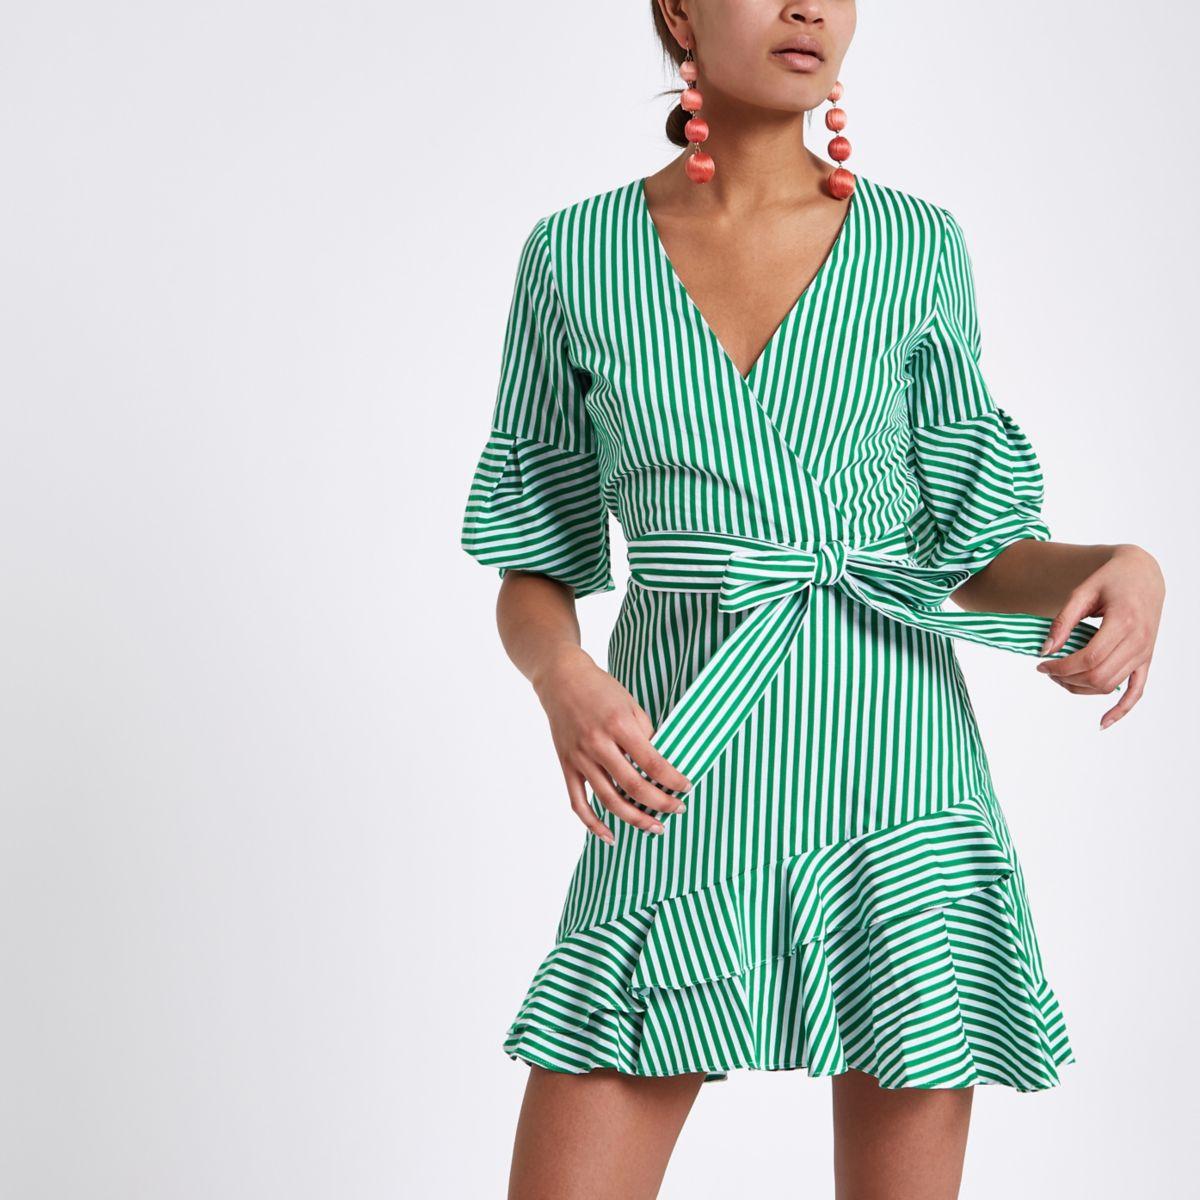 Groene gestreepte jurk met strikceintuur en ruches aan de zoom